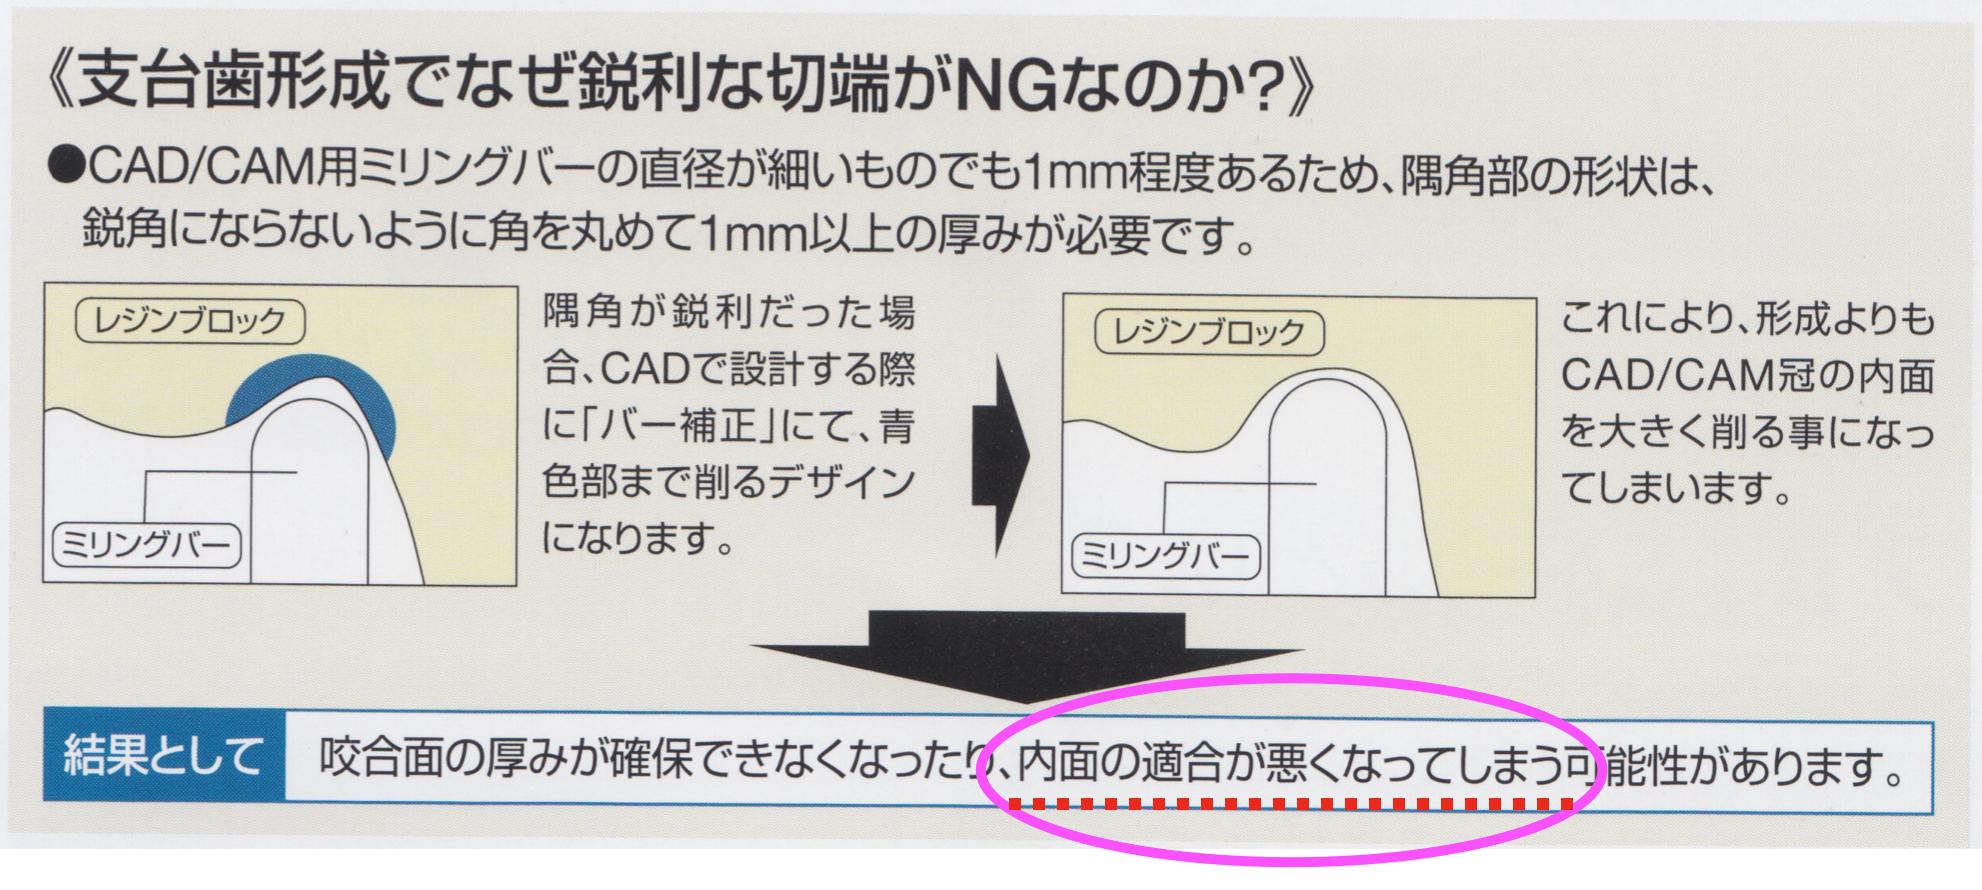 KeynoteScreenSnapz030.jpg